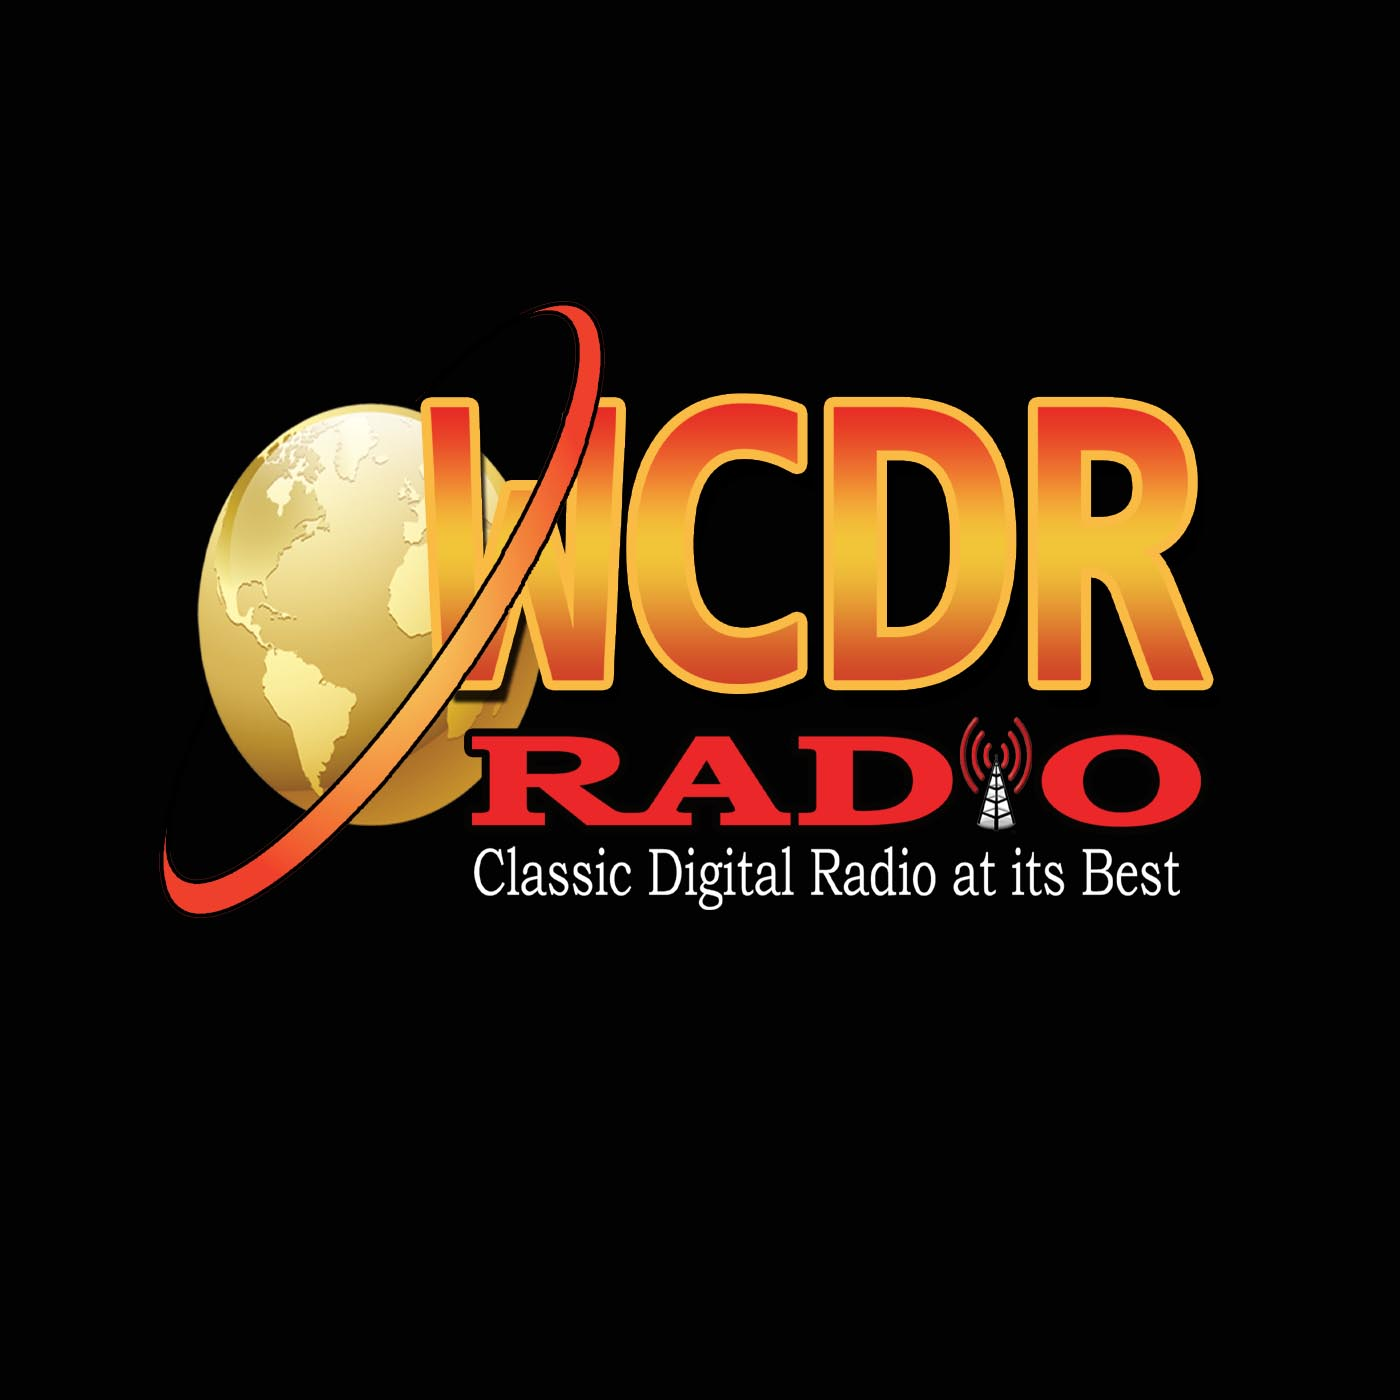 WCDR Radio live